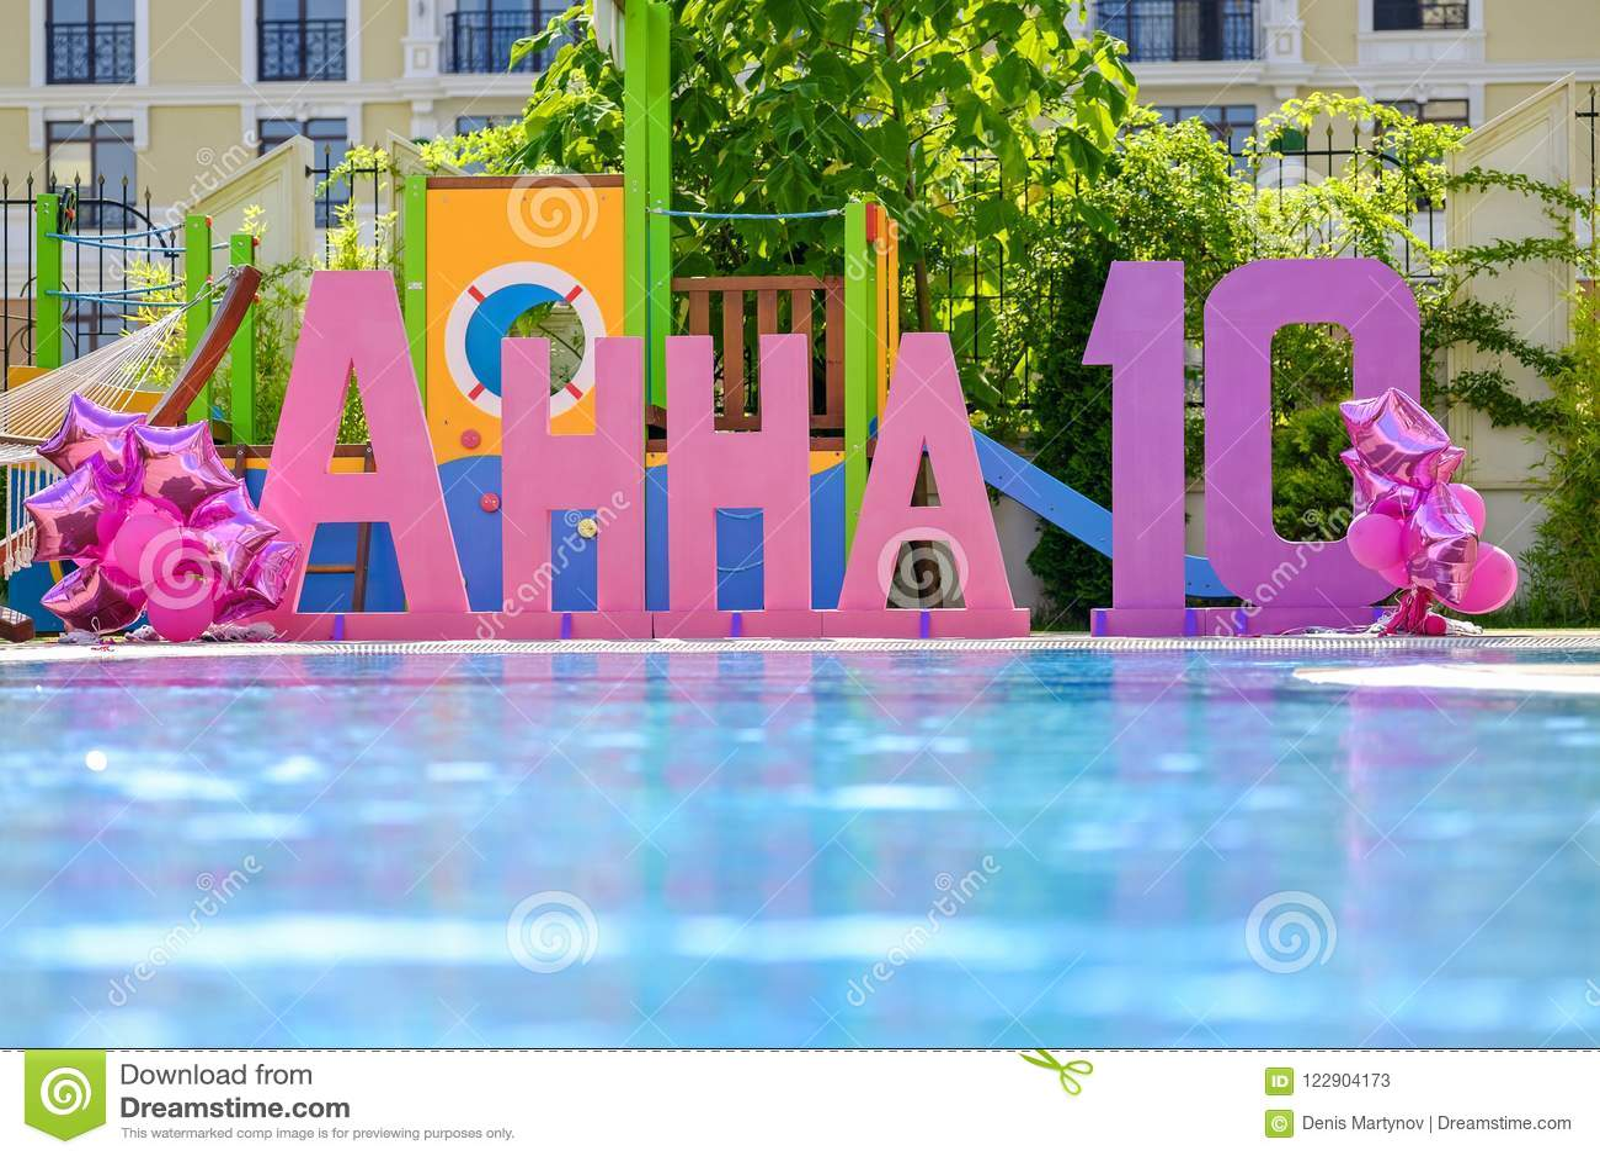 Birthday Decoration Near Swimming Pool 1 Stock Image Image Of Anniversary Element 122904173